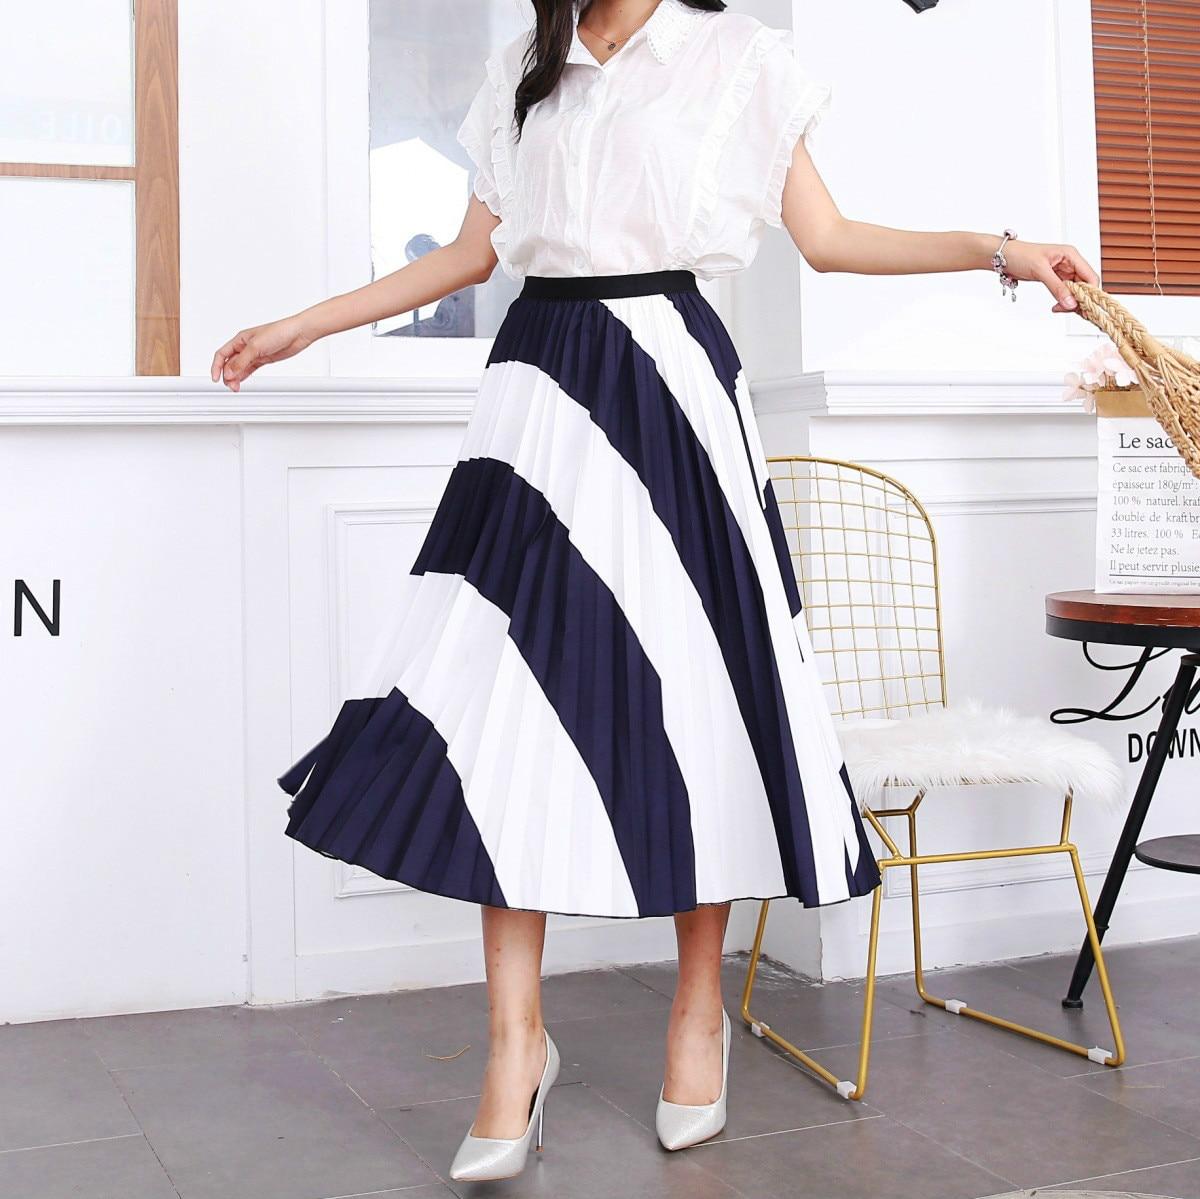 2020 New Summer Skirts Womens Butterfly Catroon Print Empire High Waist Elastci Pleated Midi Skirt European High Street Style 10